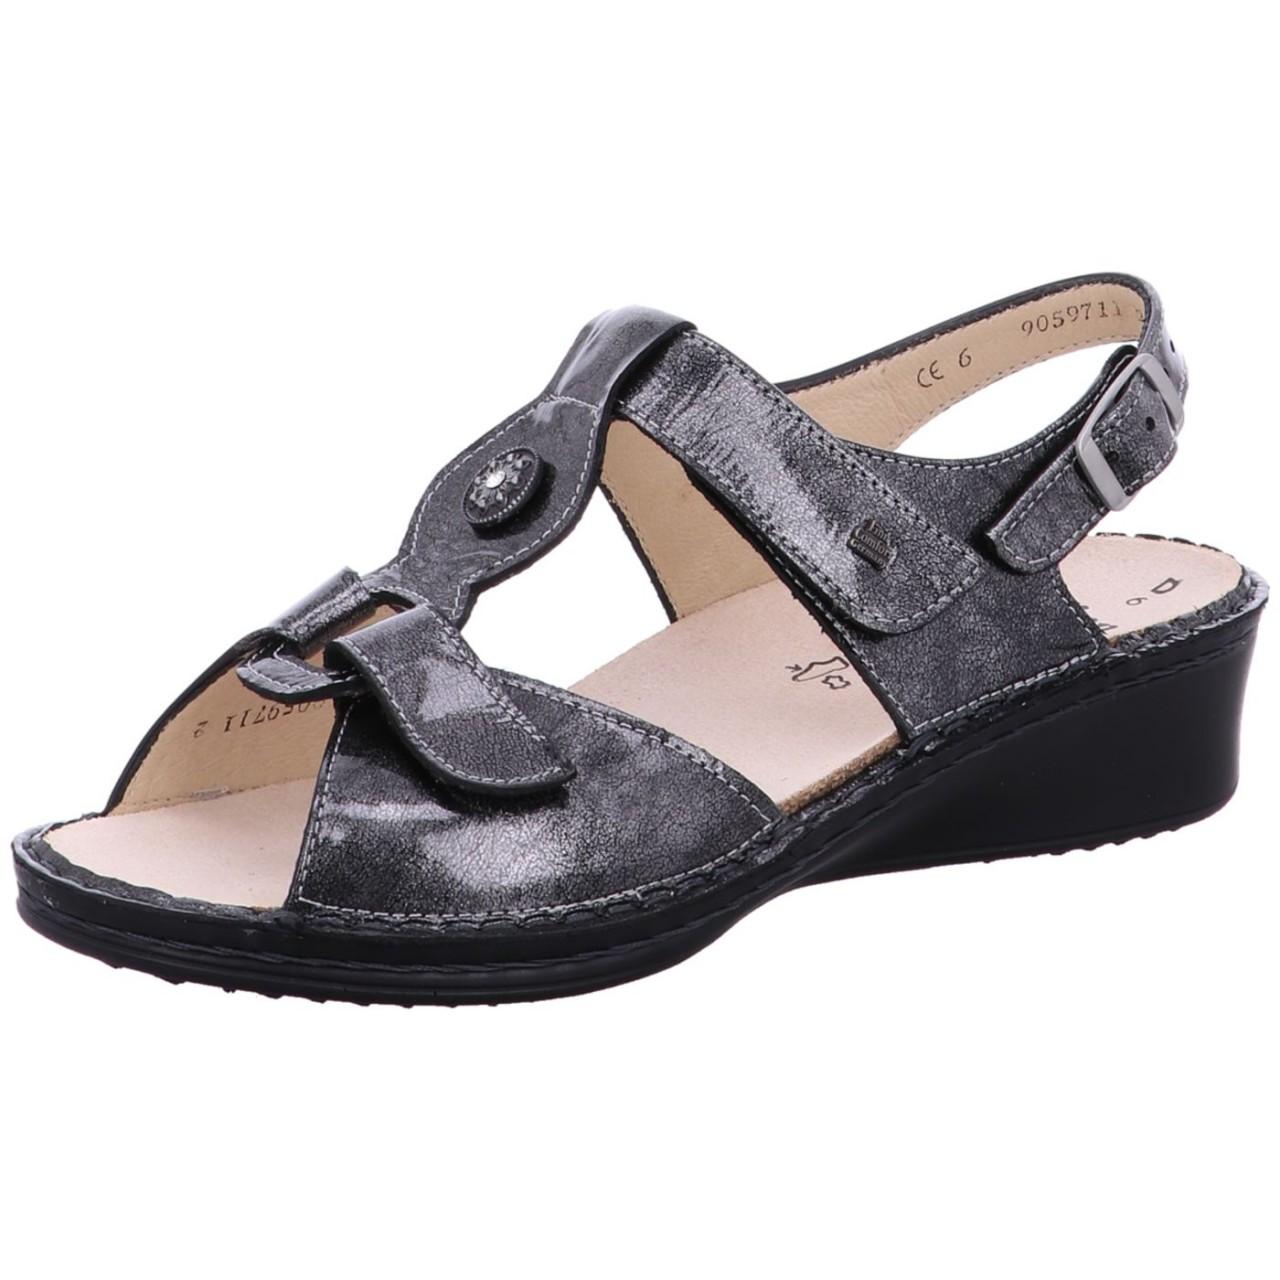 FinnComfort Sandale Adana City Metallic argento Adana 579297